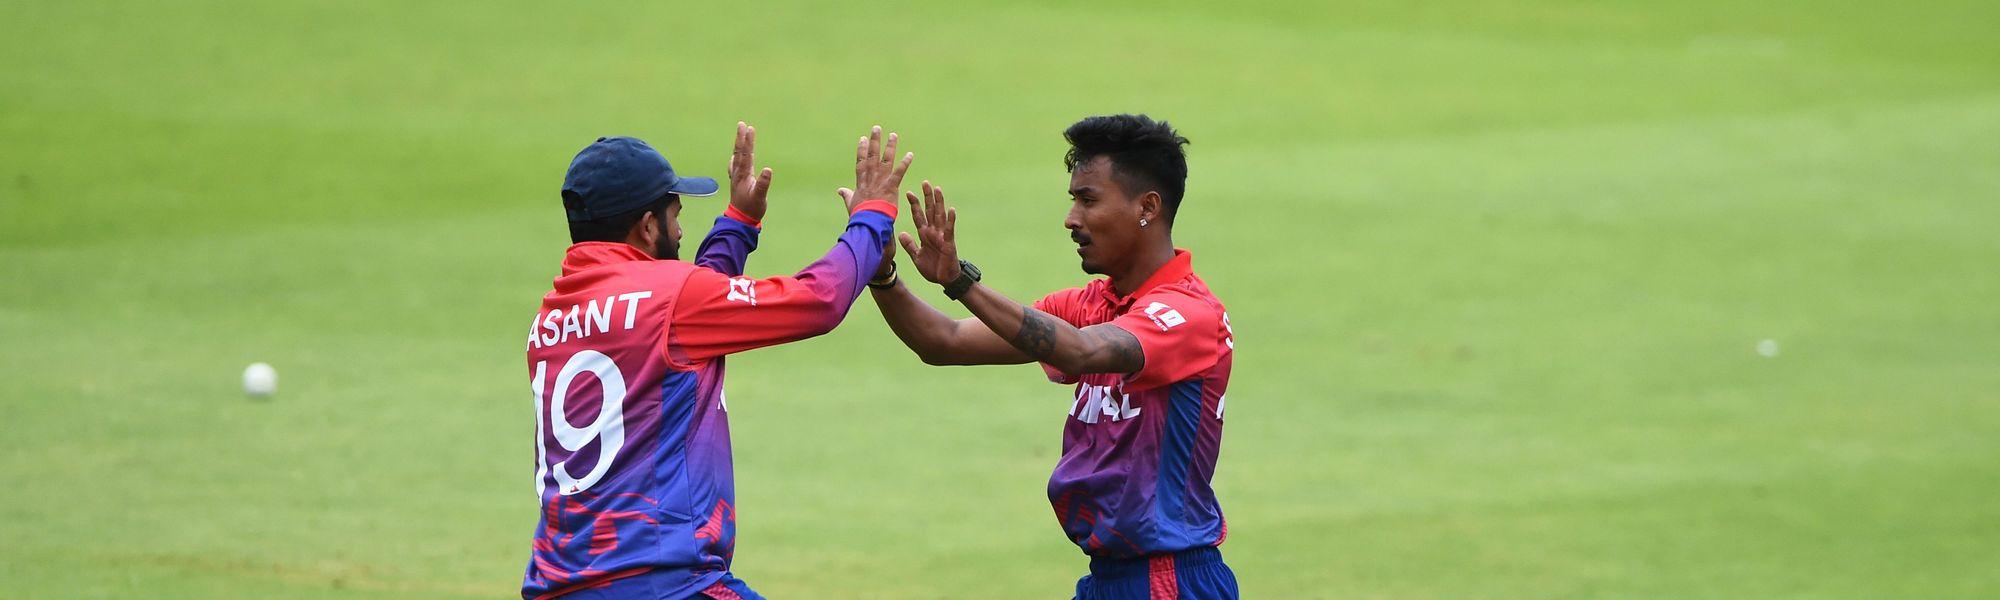 Nepal men's team is preparing for a quadrangular series in Qatar